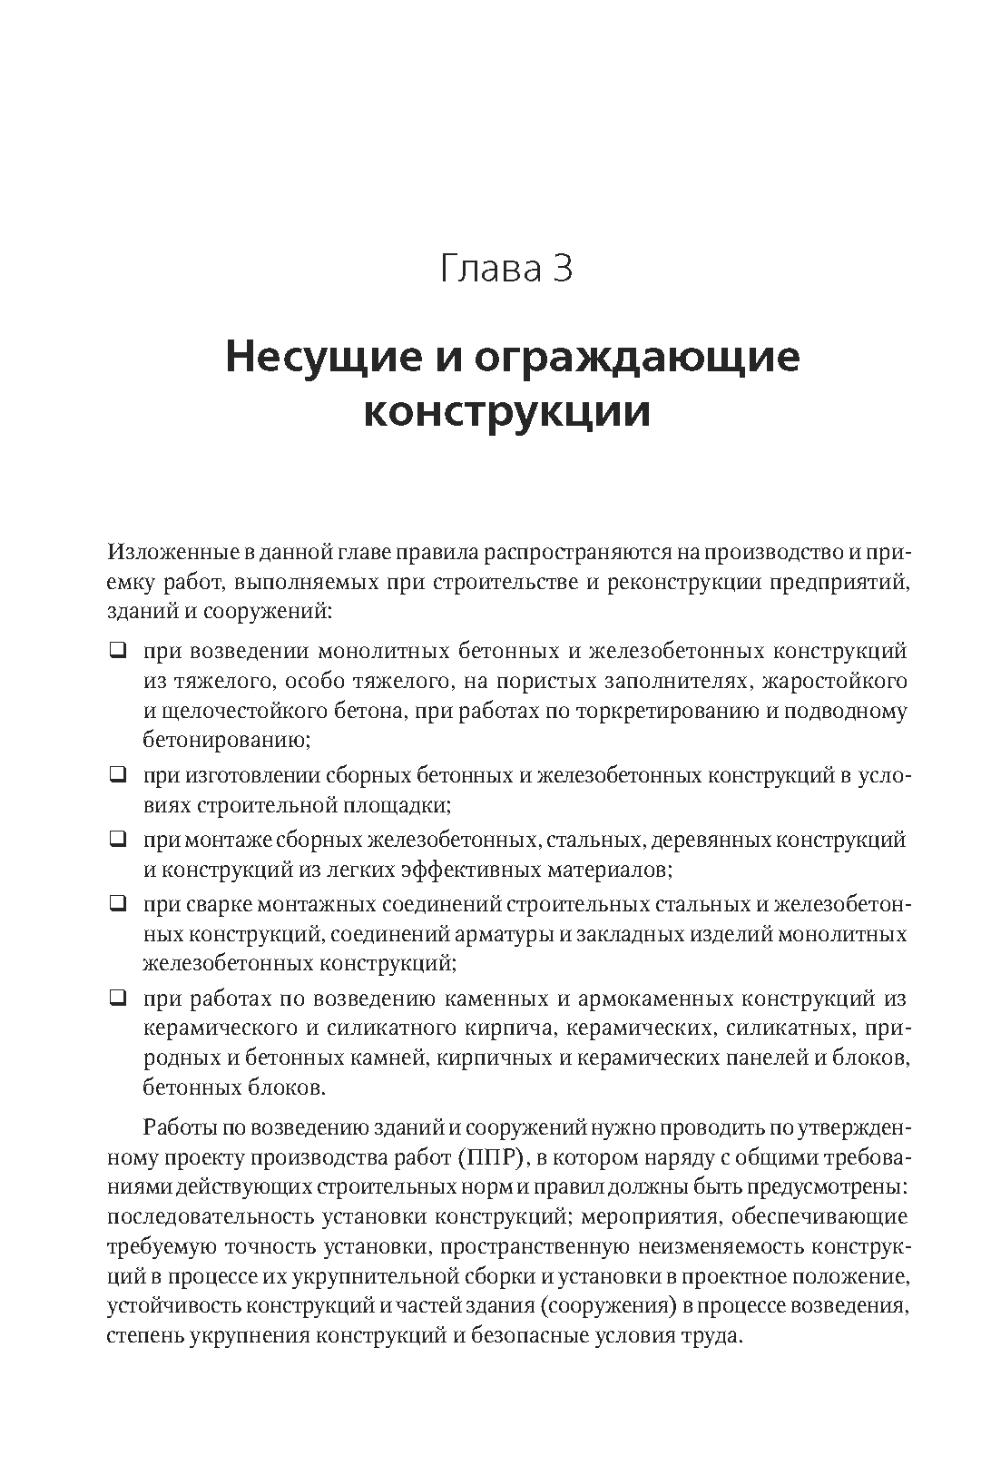 http://i6.imageban.ru/out/2013/11/04/0433017ee501b6761e5bffefb0a51317.jpg